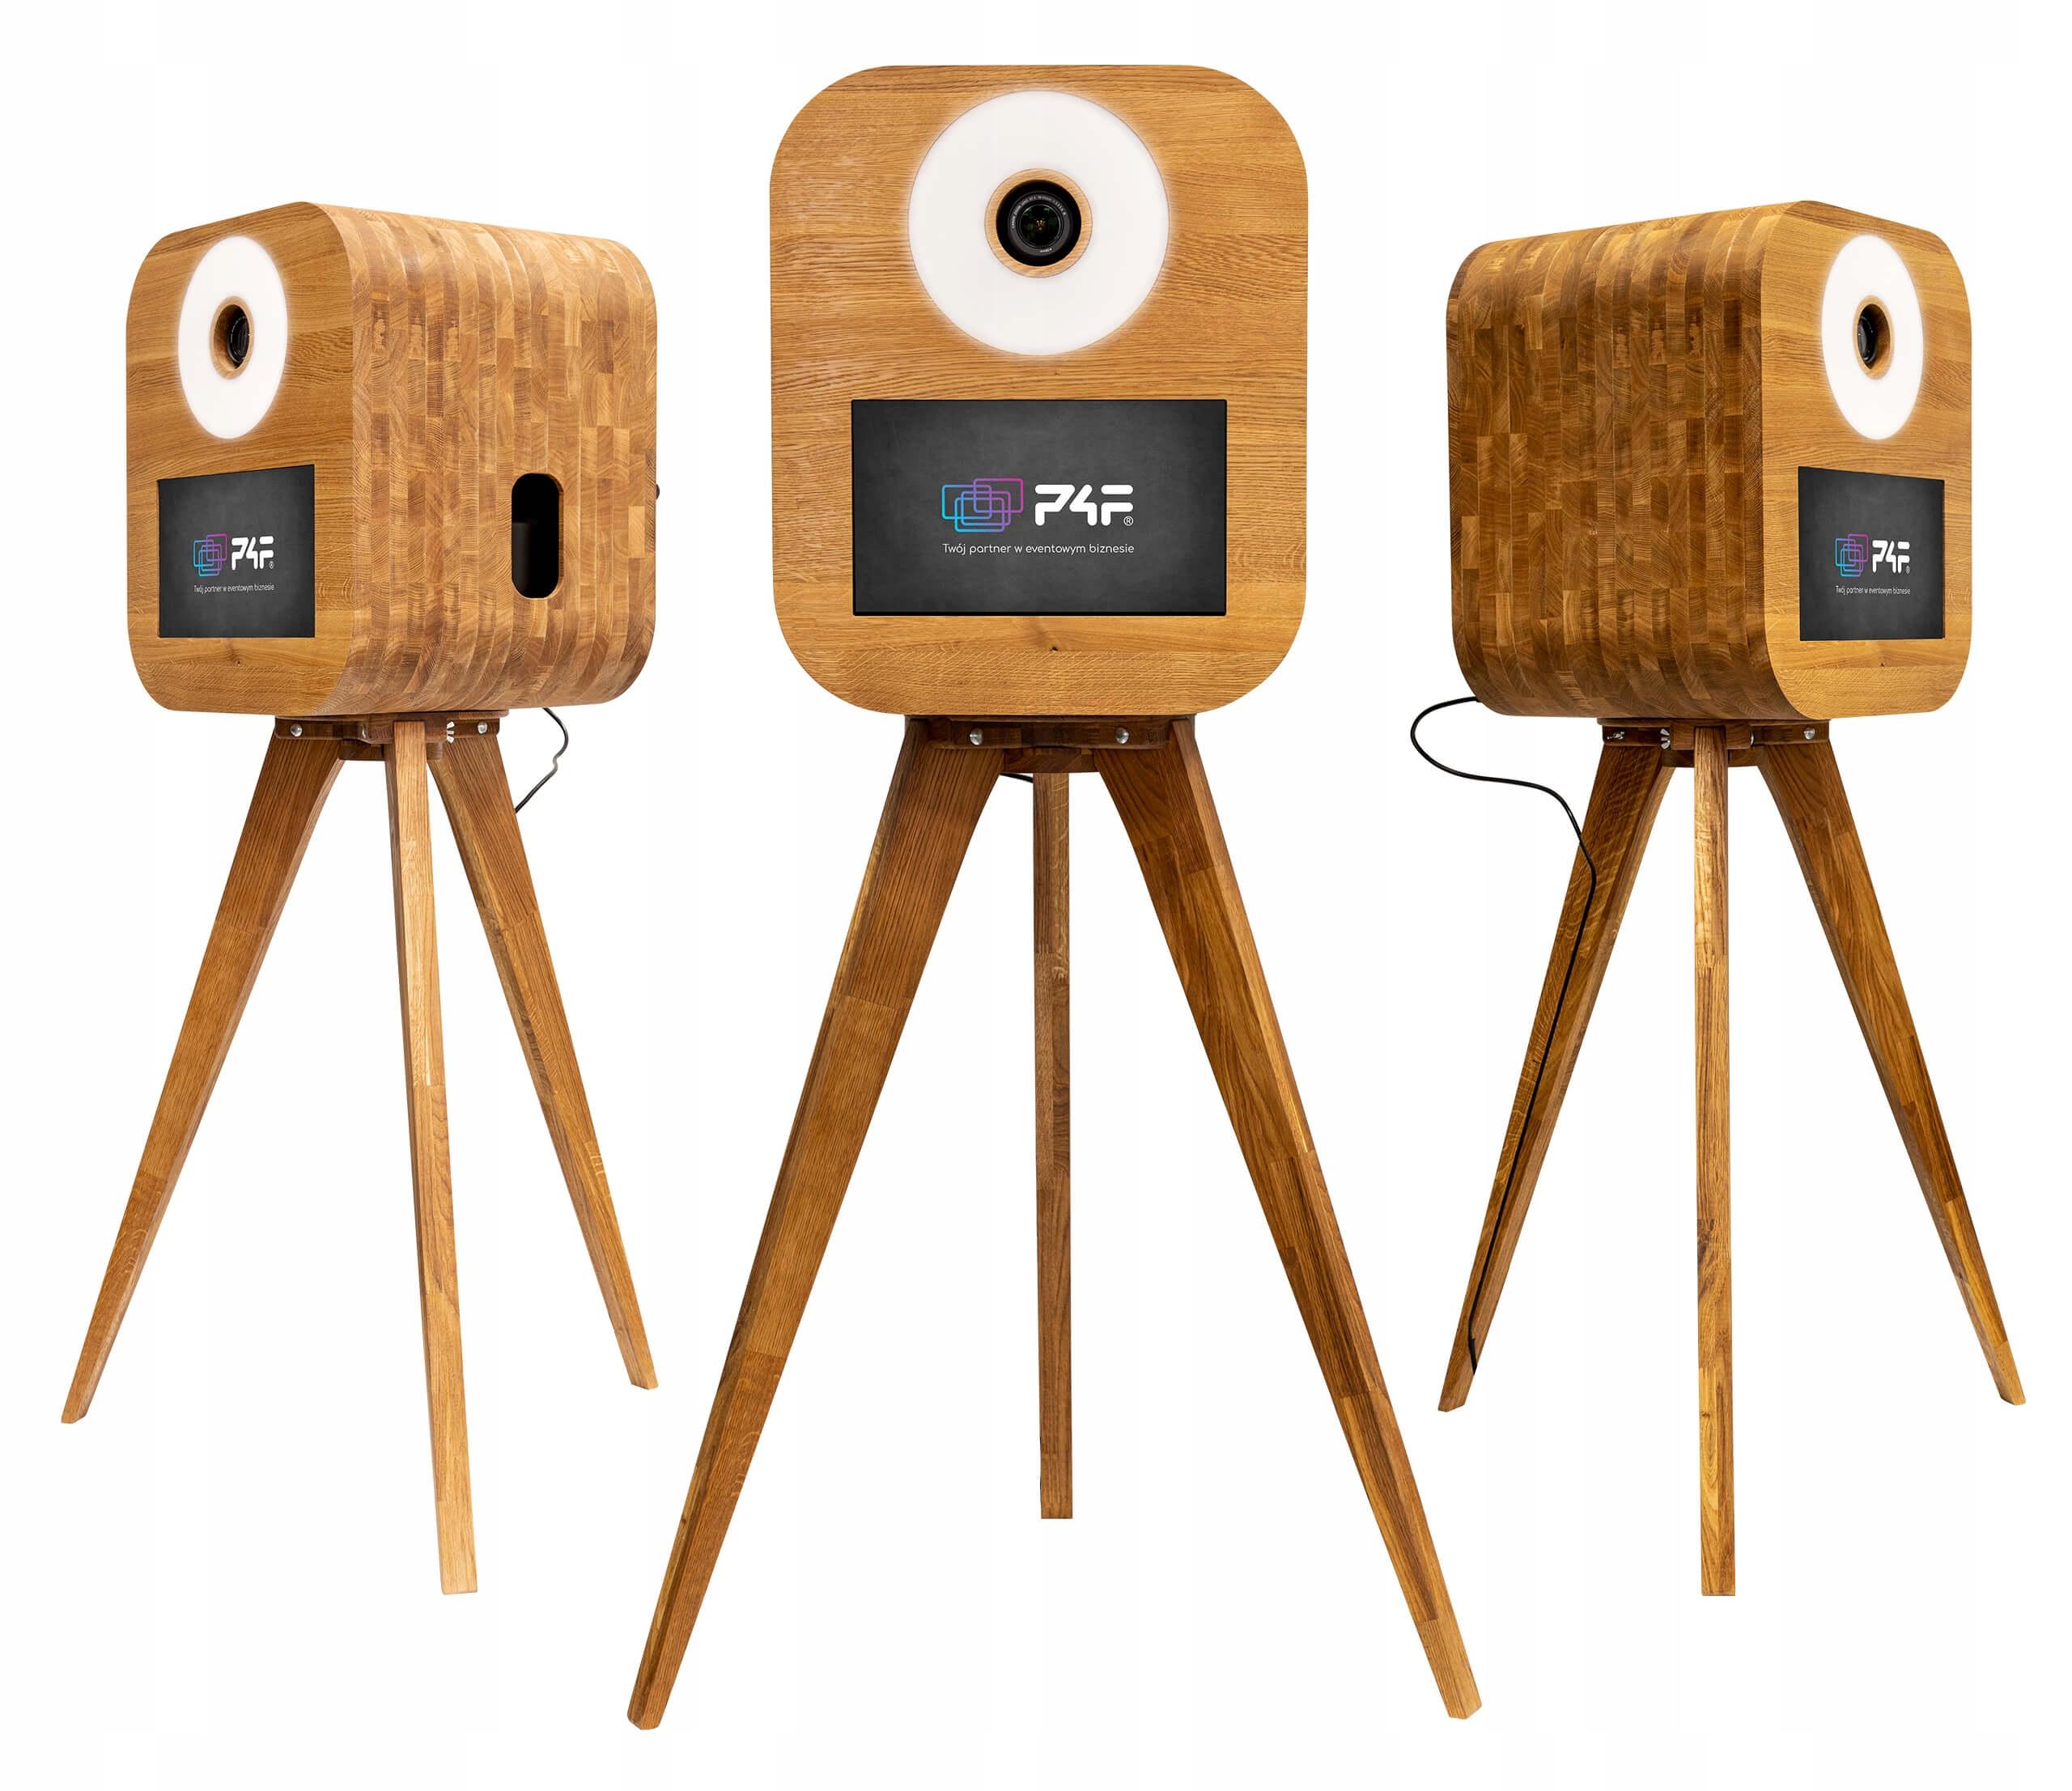 FOTO BOX P4F RETRO M retrobox vyrobený z dreva Full